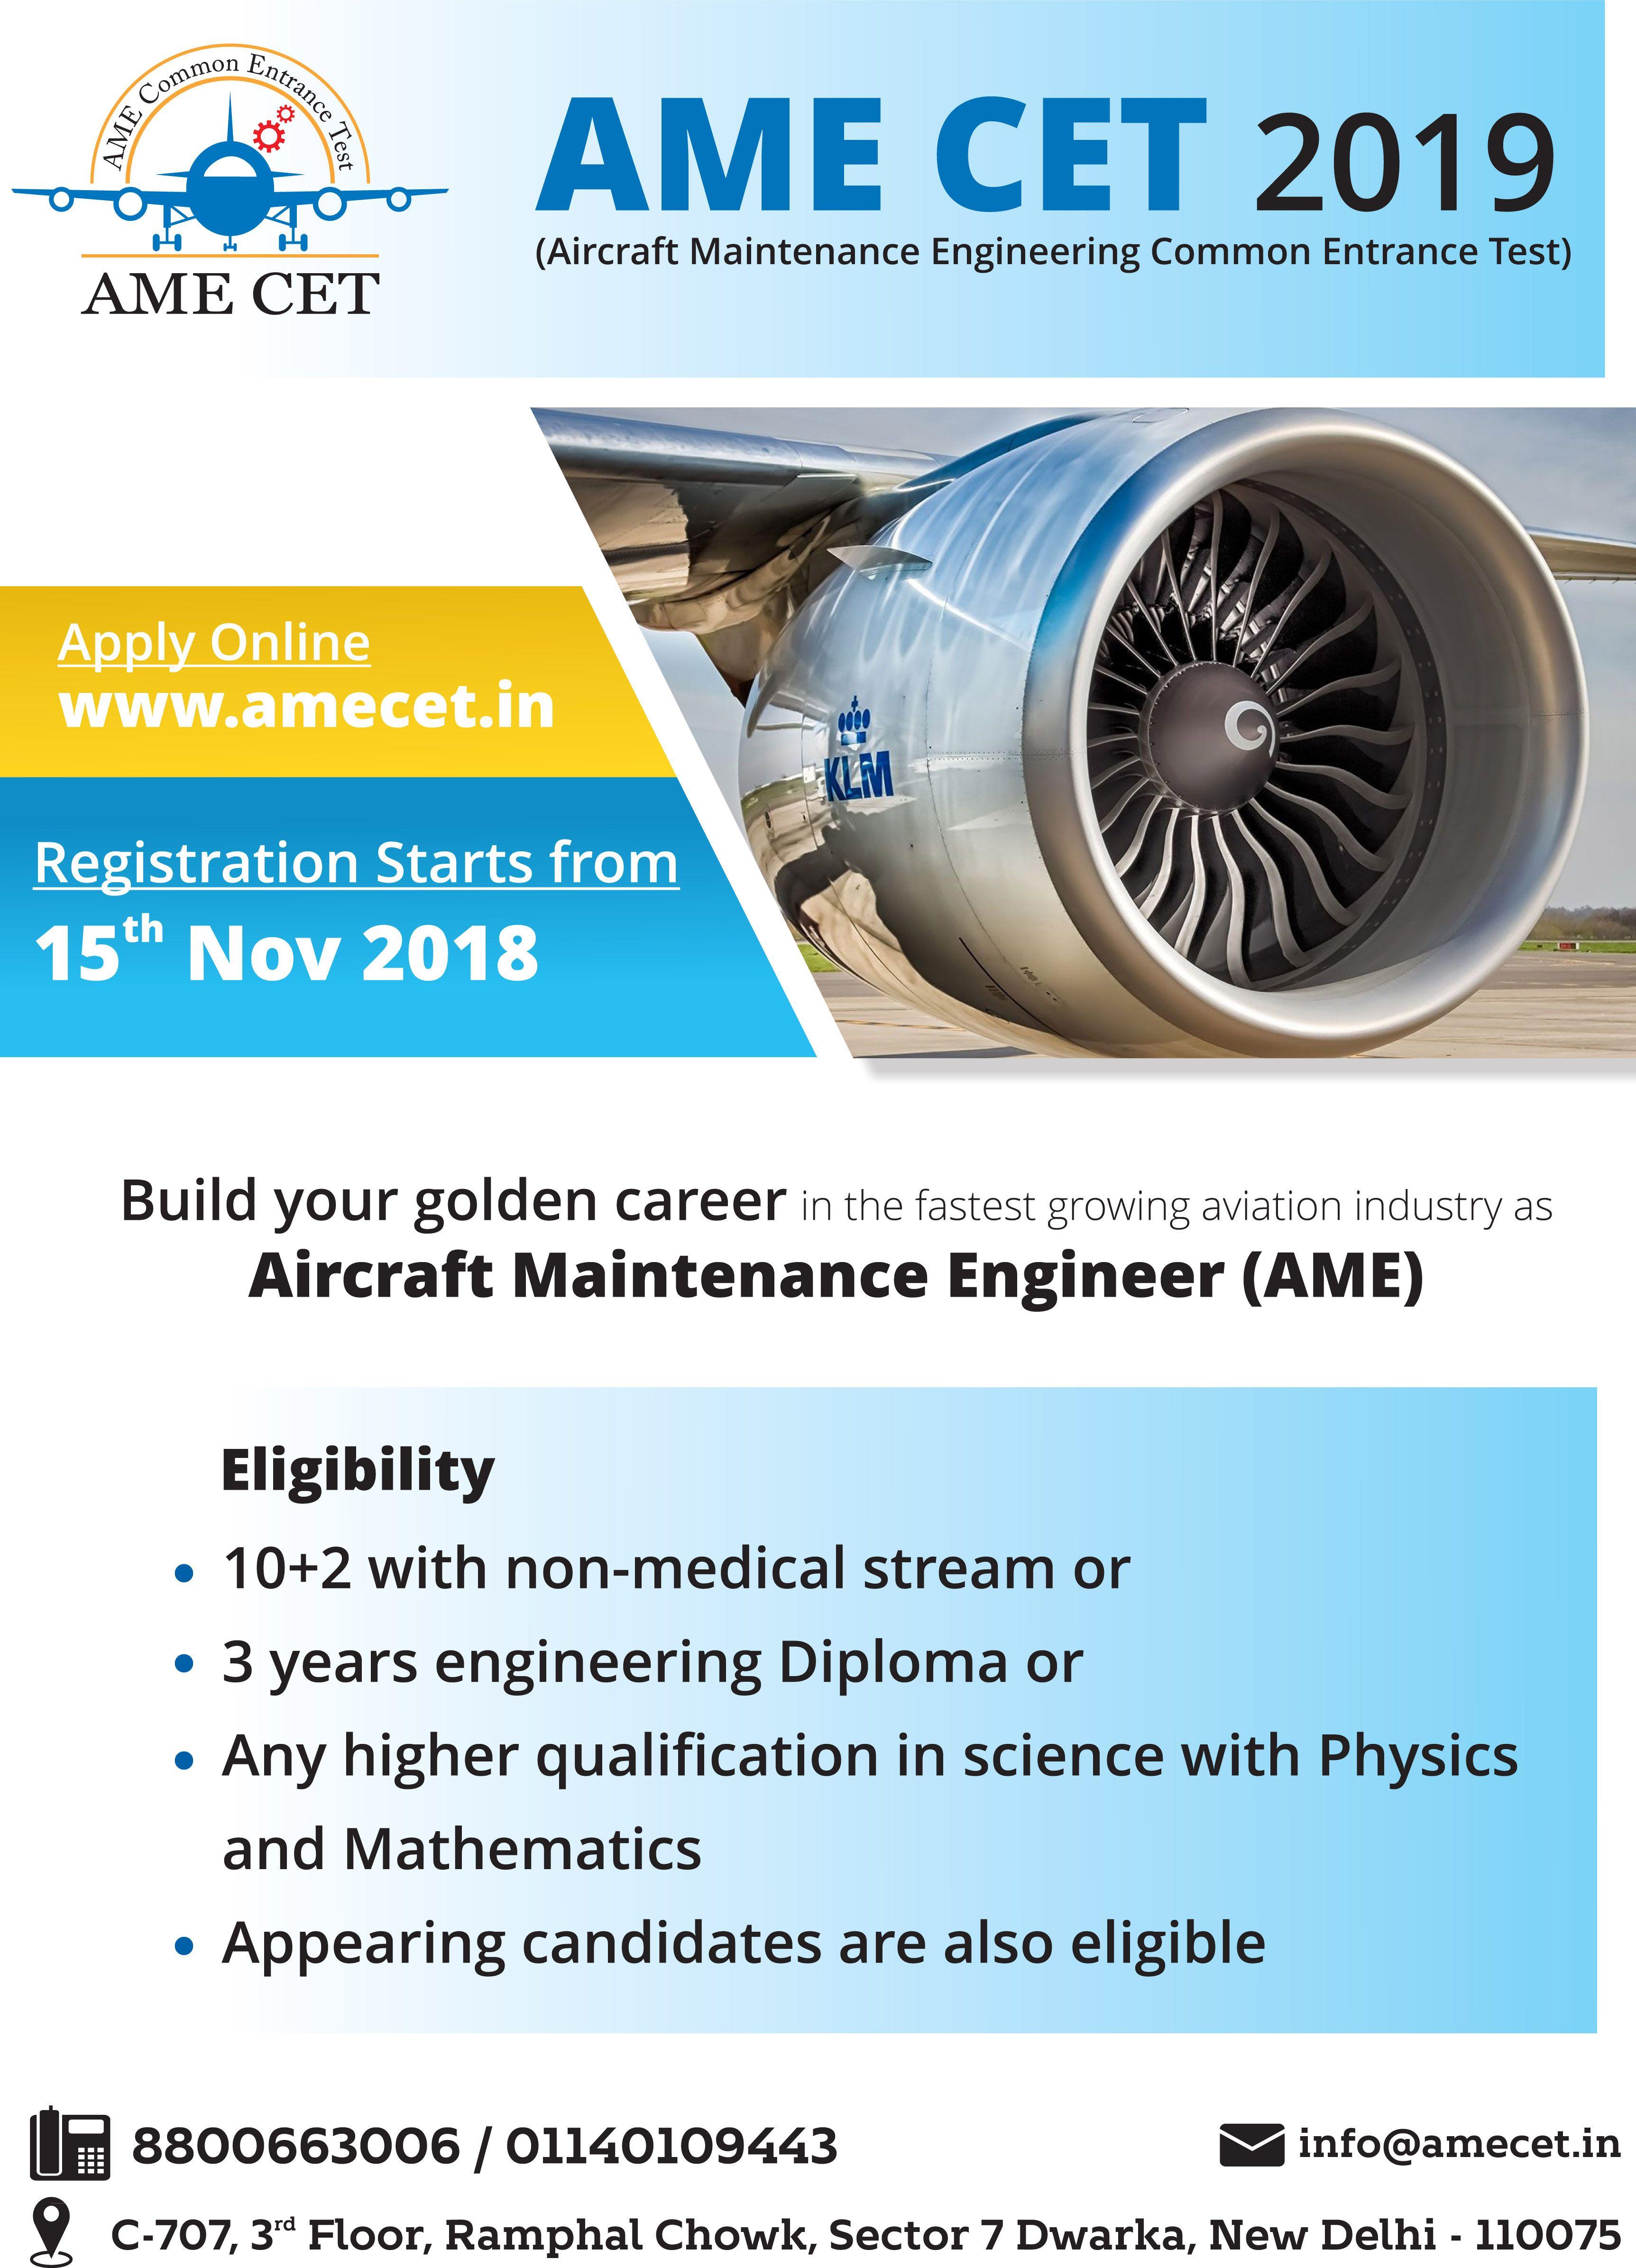 Pin On Ame Aircraft Maintenance Engineer